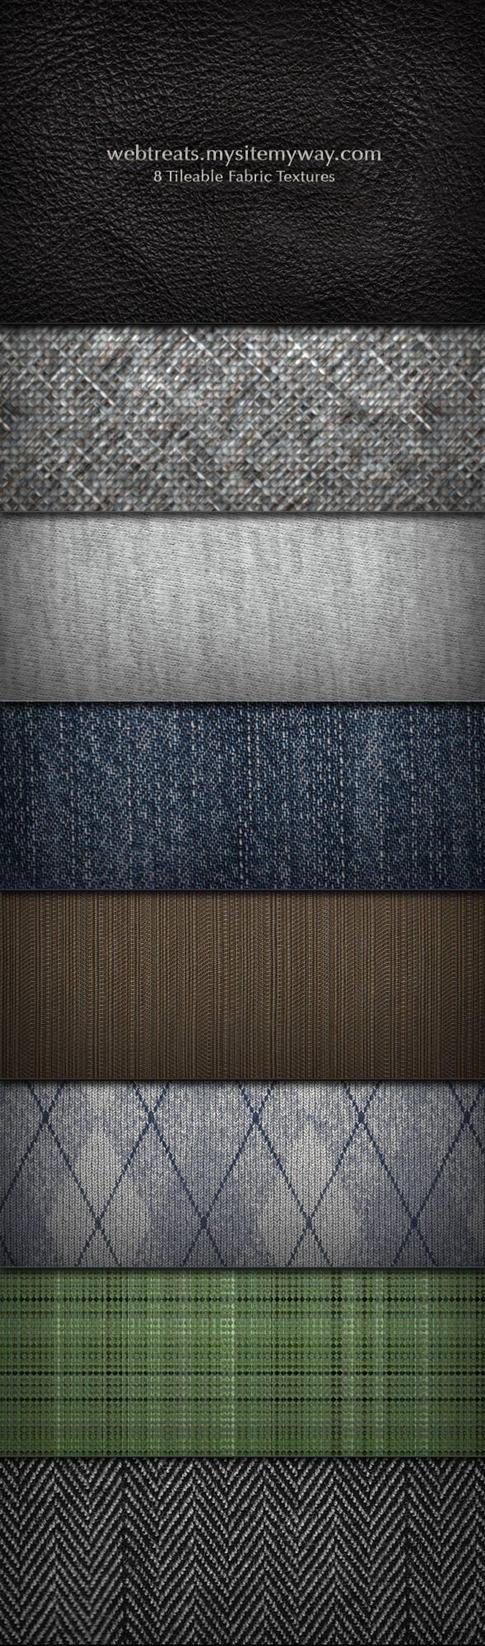 Fabric Texture and Pattern Set by WebTreatsETC